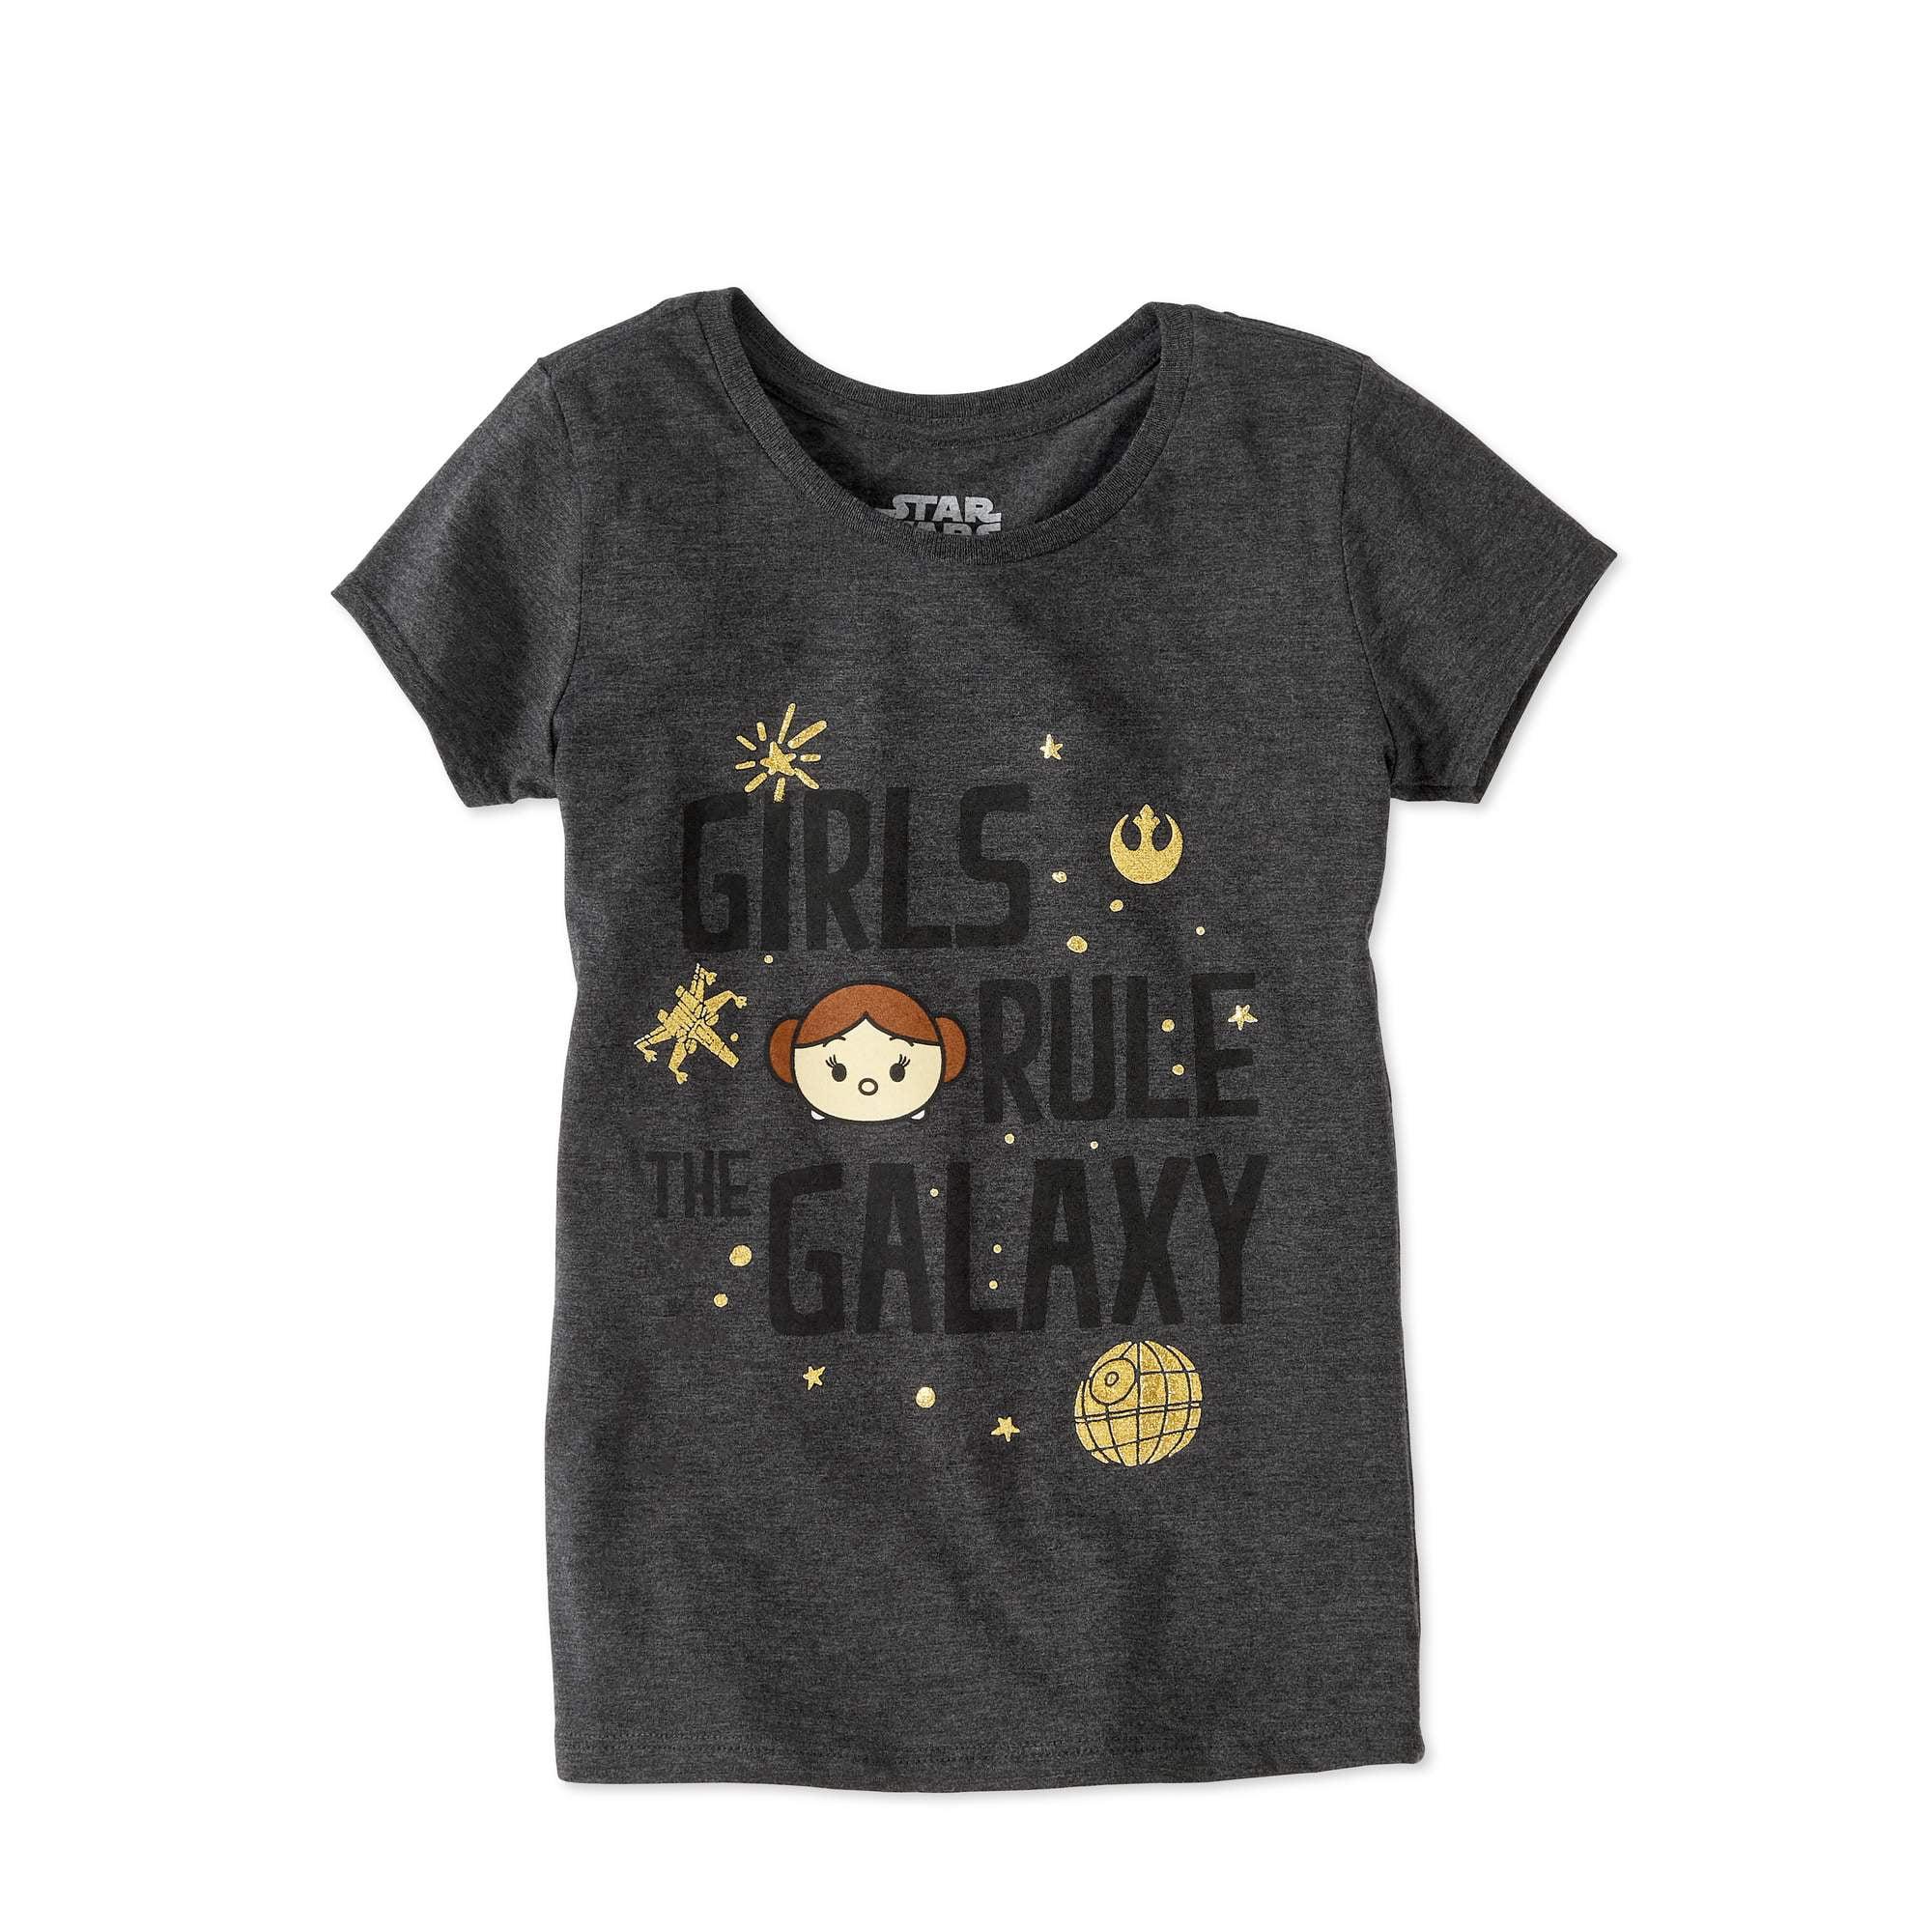 "Tsum Tsum Star Wars Girls' Princess Leia ""Girls Rule the Galaxy"" Graphic T-Shirt"